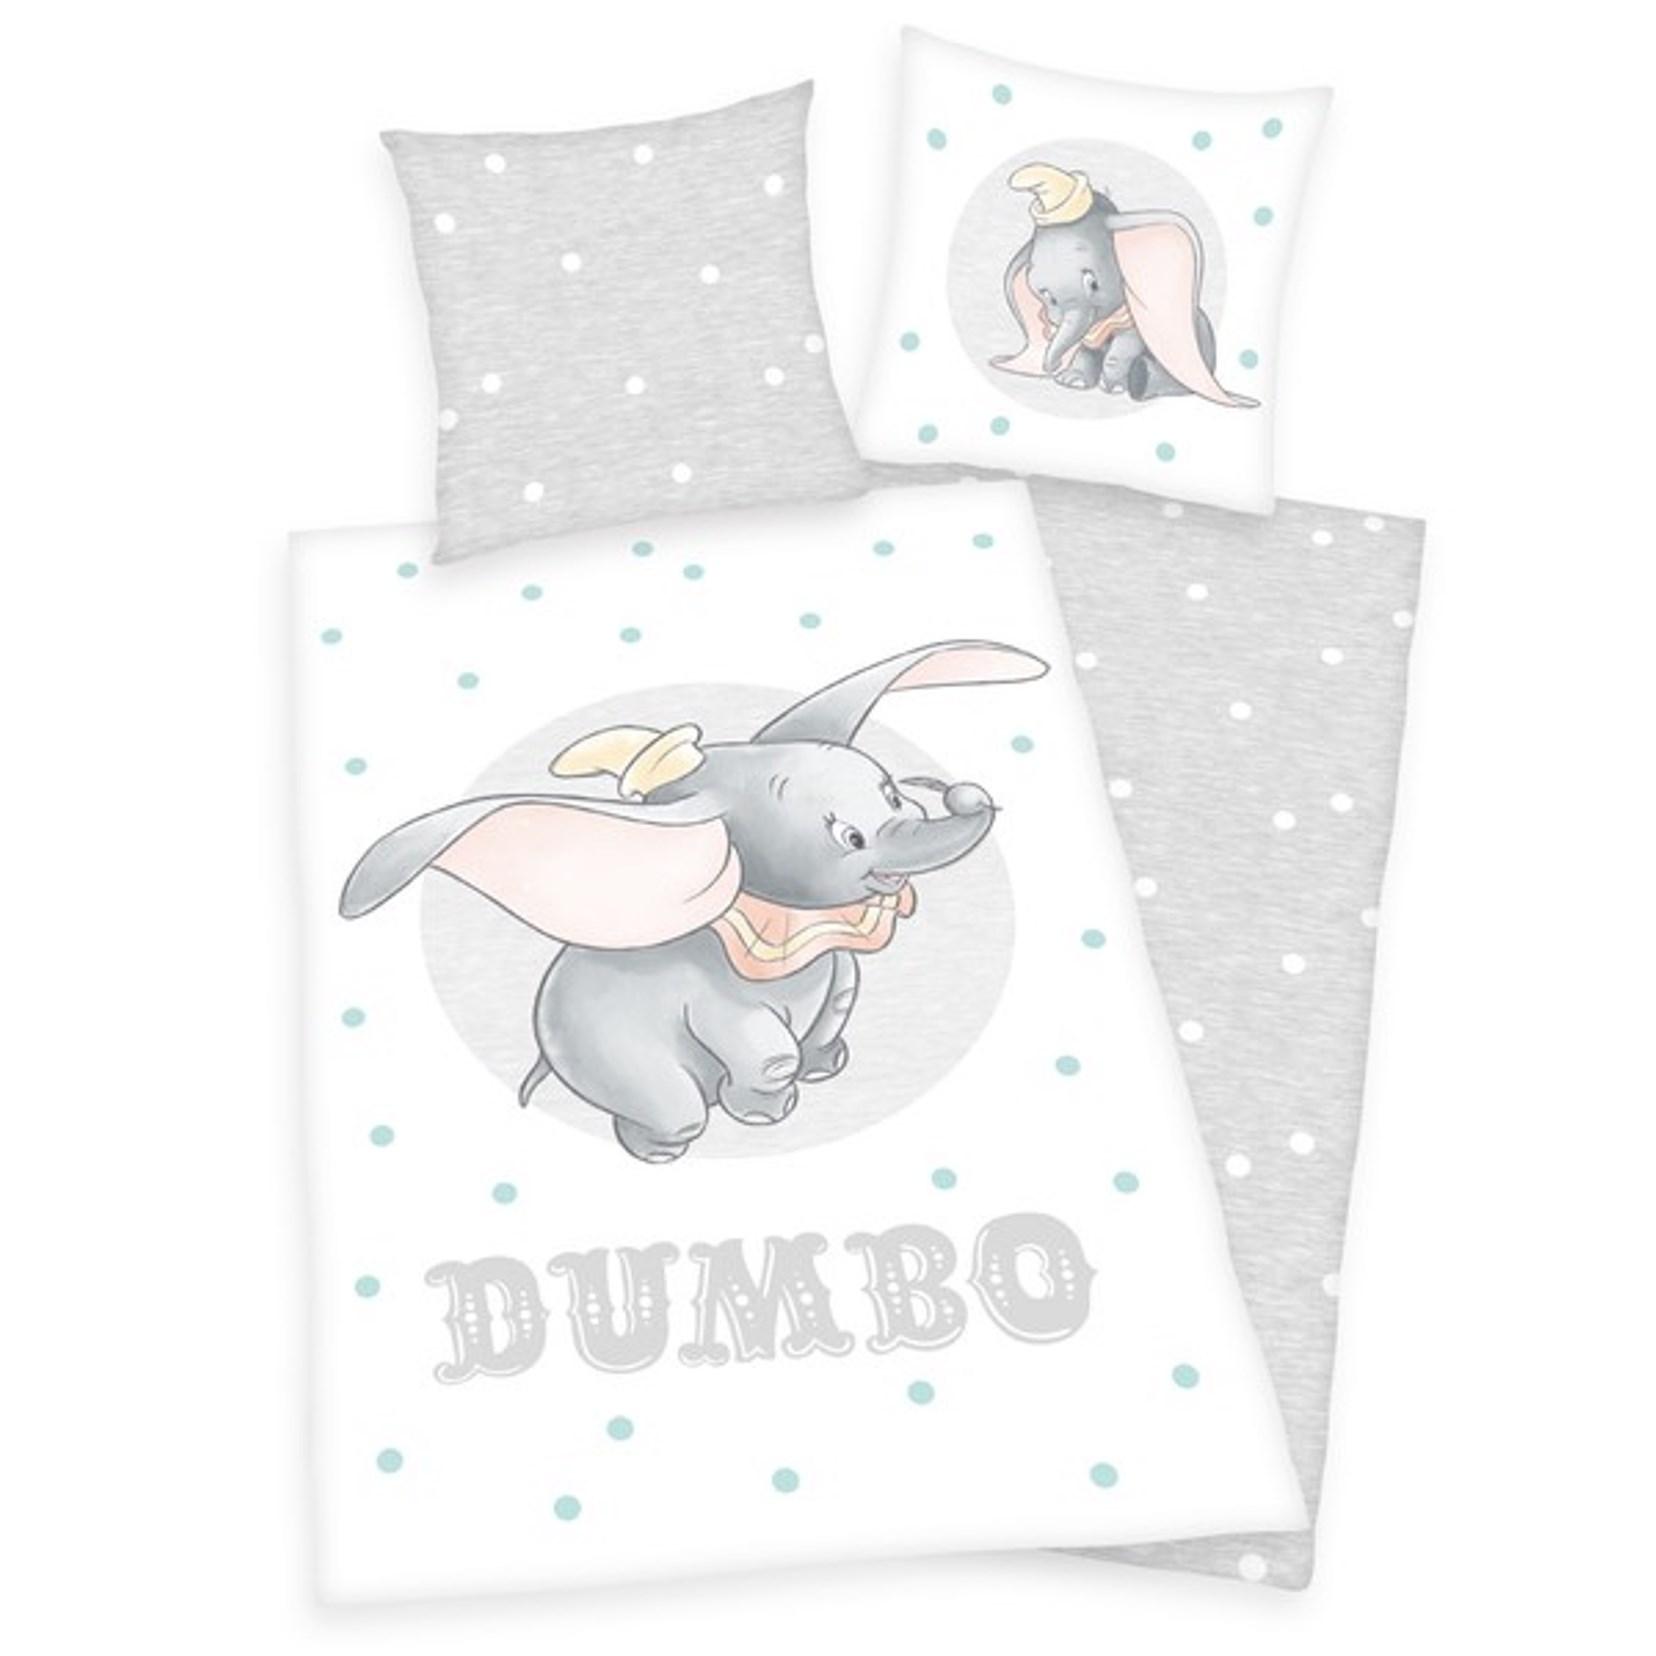 Herding Bettwäsche Disney Dumbo 80 X 80 Cm 135 X 200 Cm 100